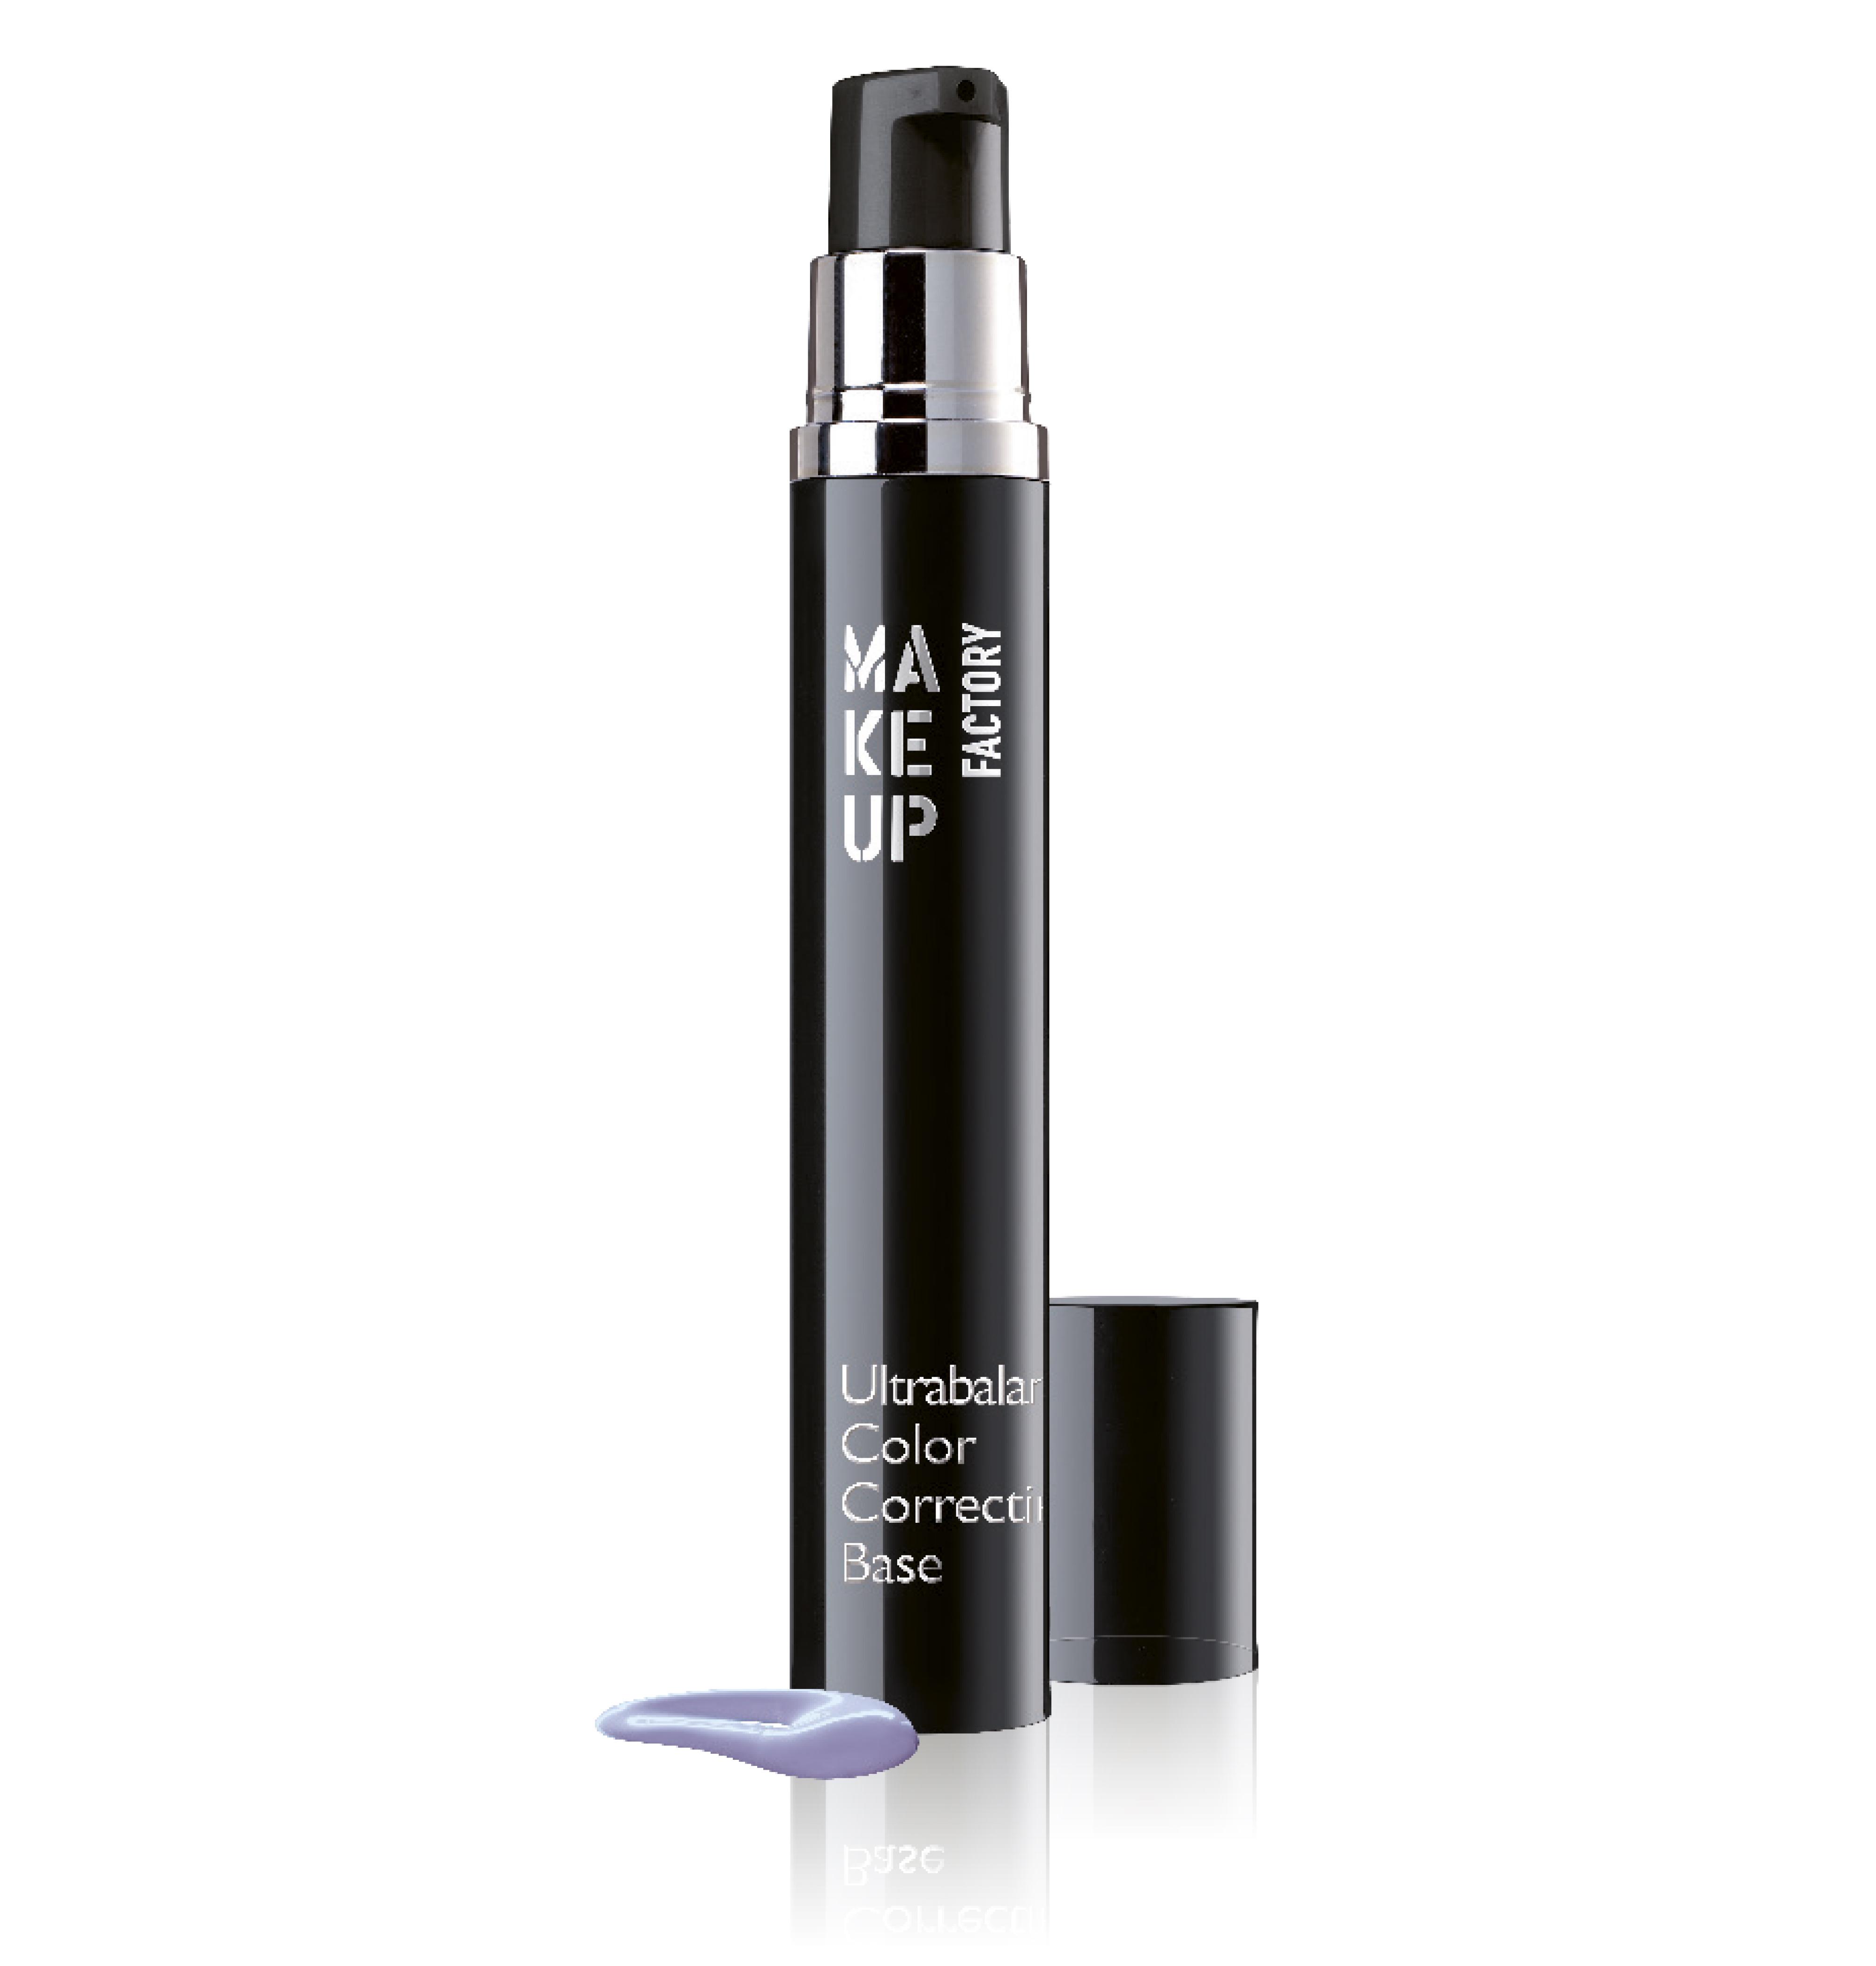 MAKE UP FACTORY База под макияж корректирующая цвет лица, 07 лаванда / Ultrabalance Color Correcting Base 15 мл